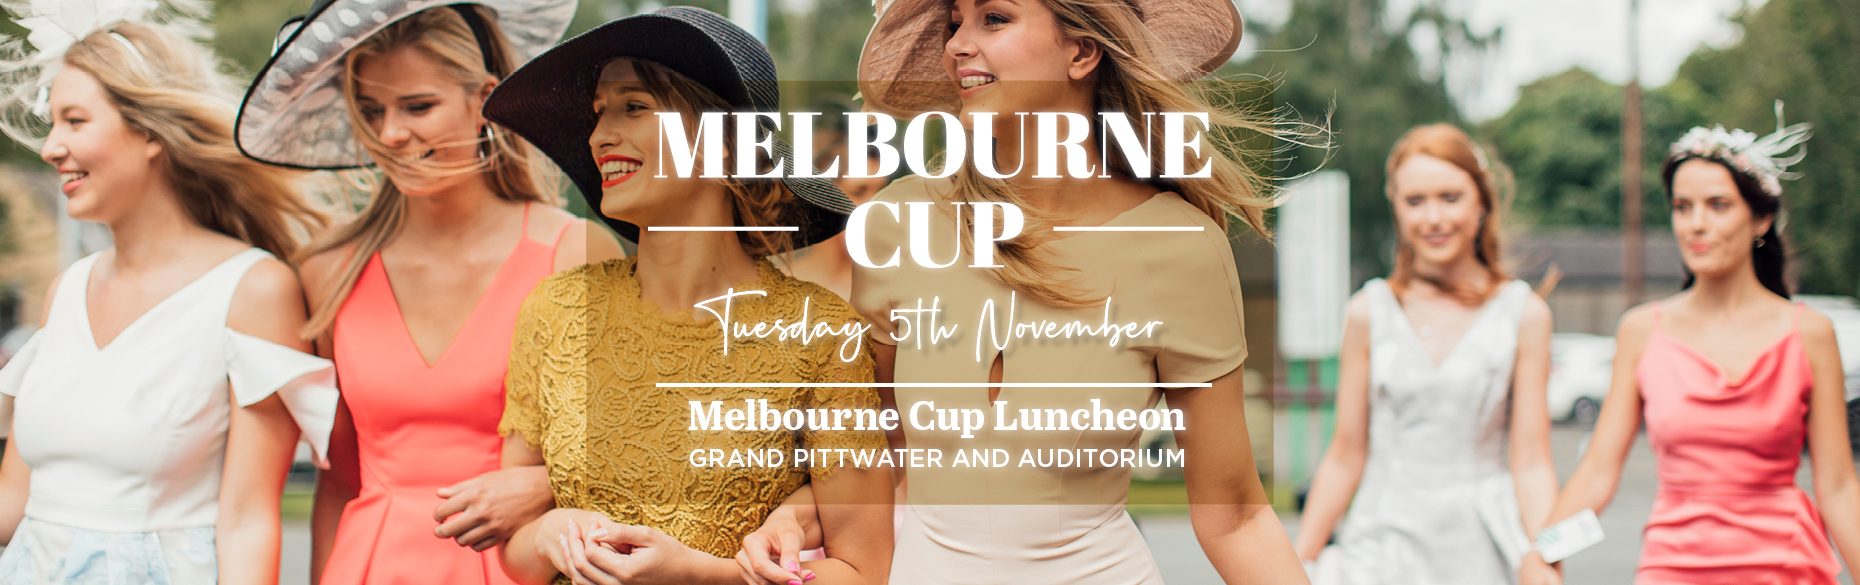 NRSL_Melbourne-Cup_Web-Banner